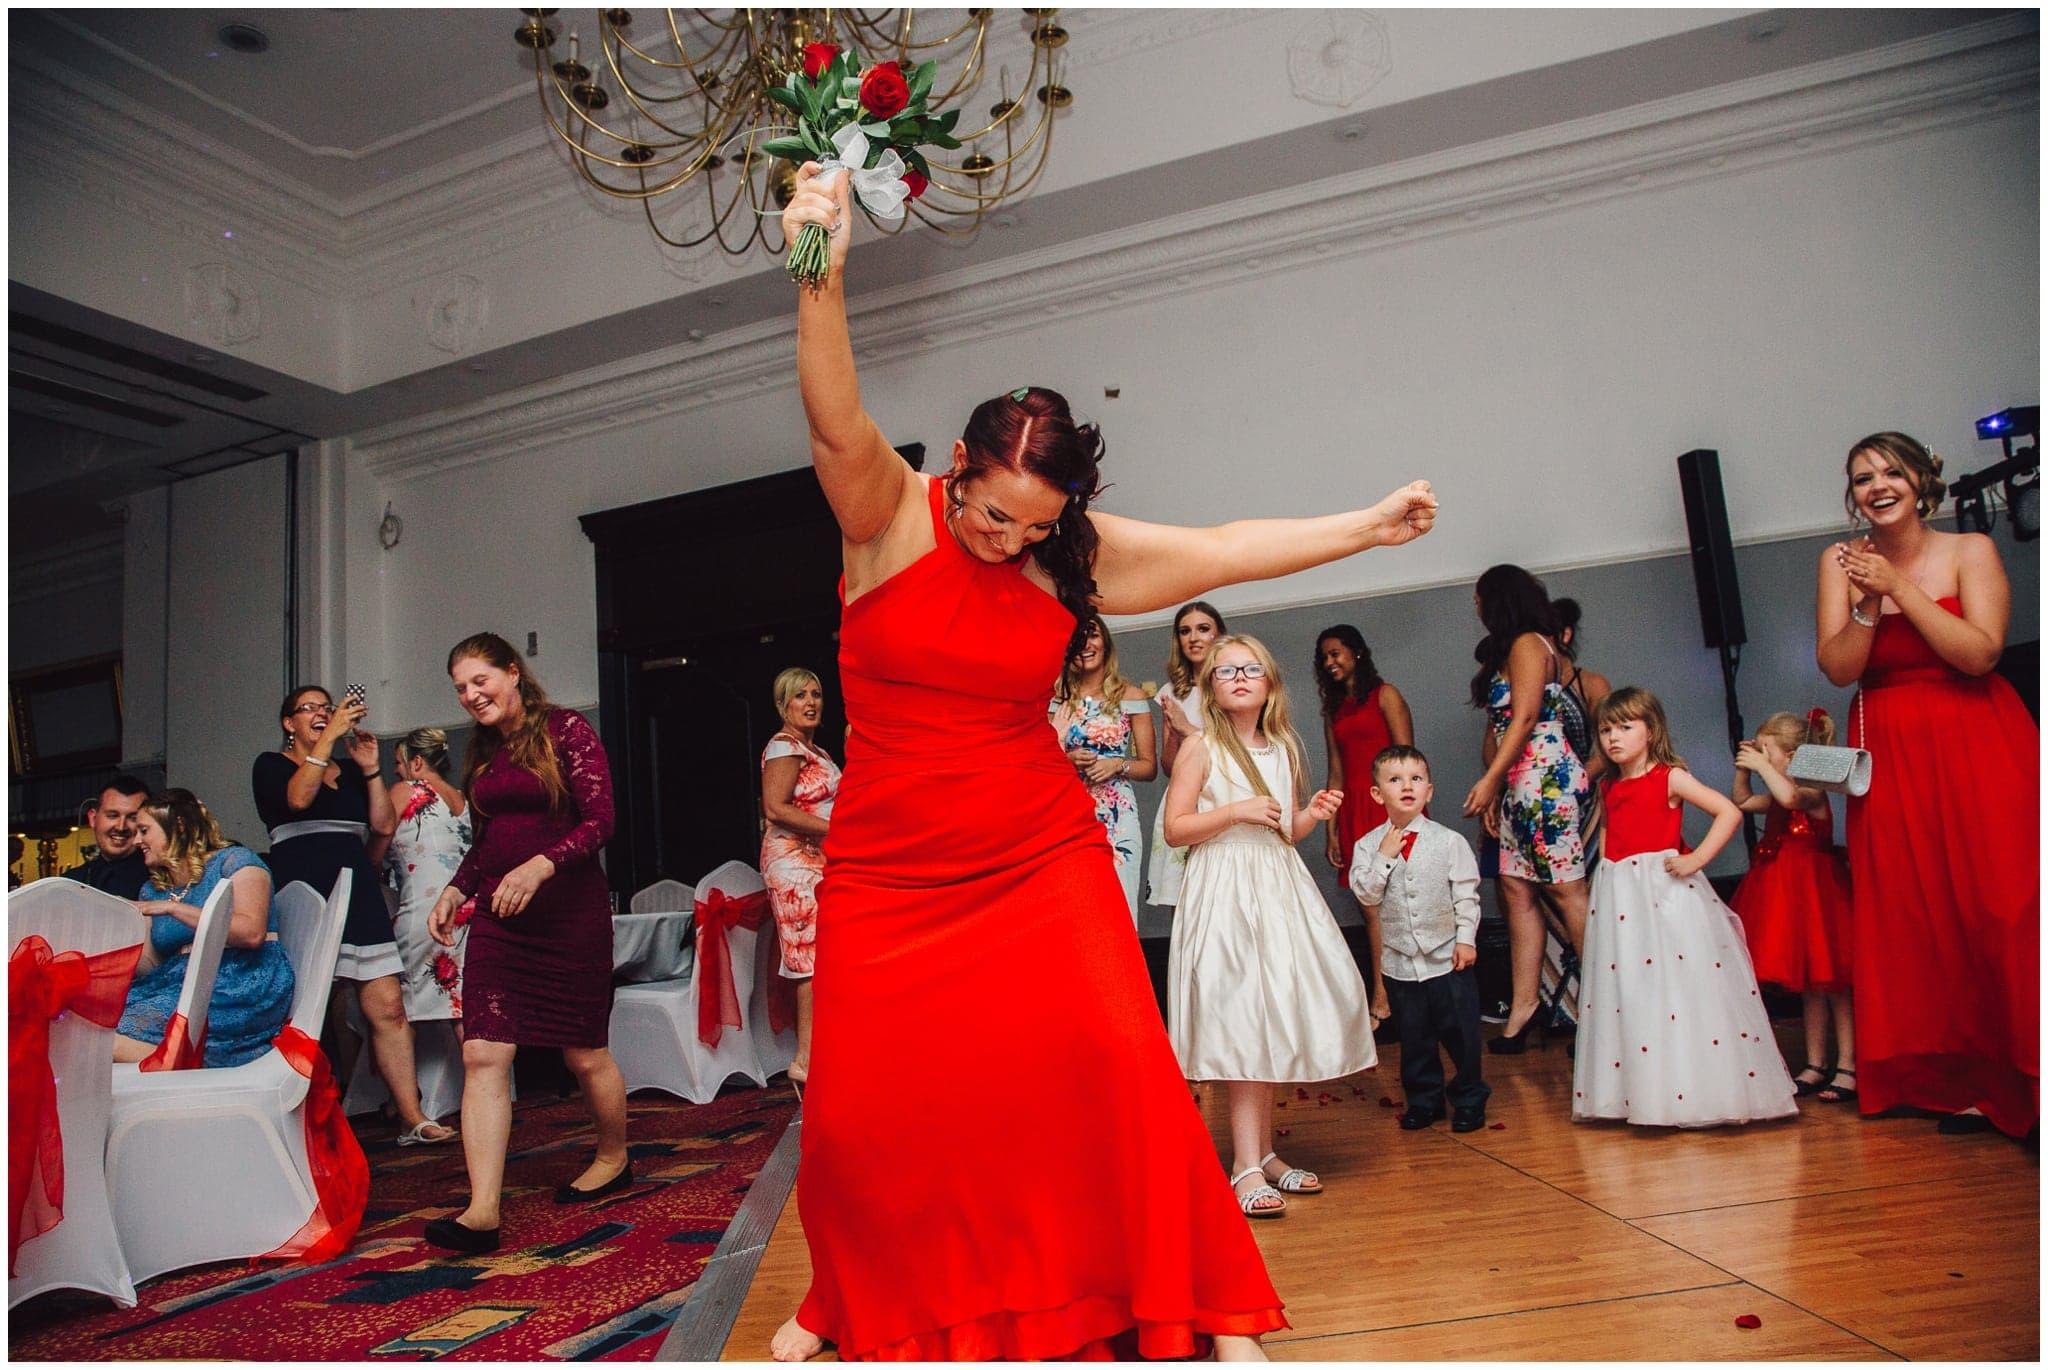 coventry-wedding-photographerx-10